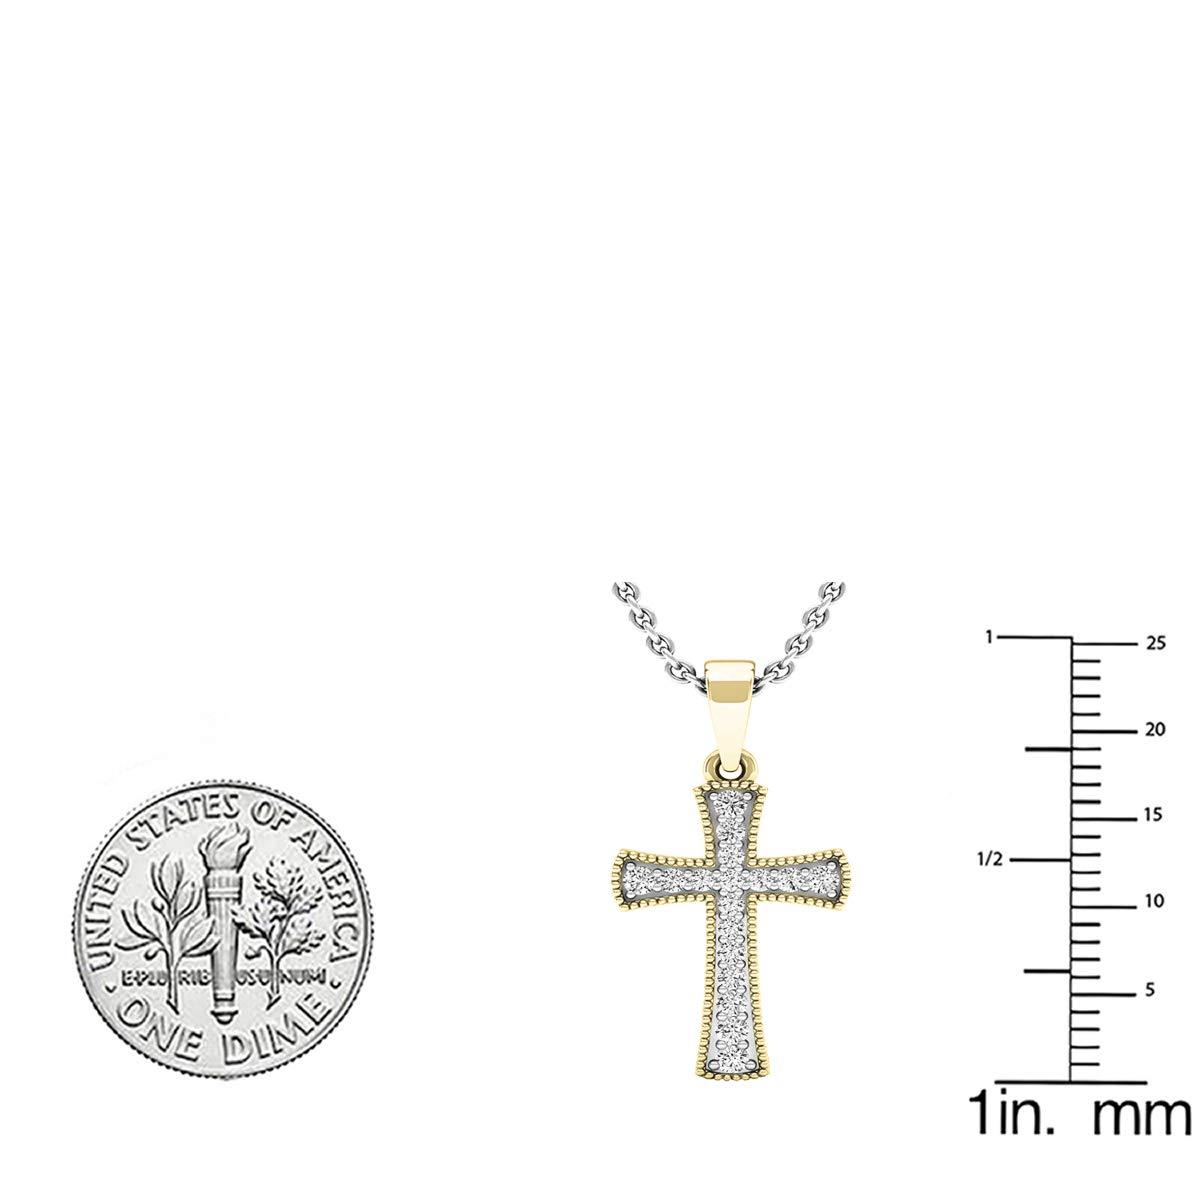 10K Gold Round White Diamond Mens Ladies Unisex Cross Pendant ctw Dazzlingrock Collection 0.20 Carat